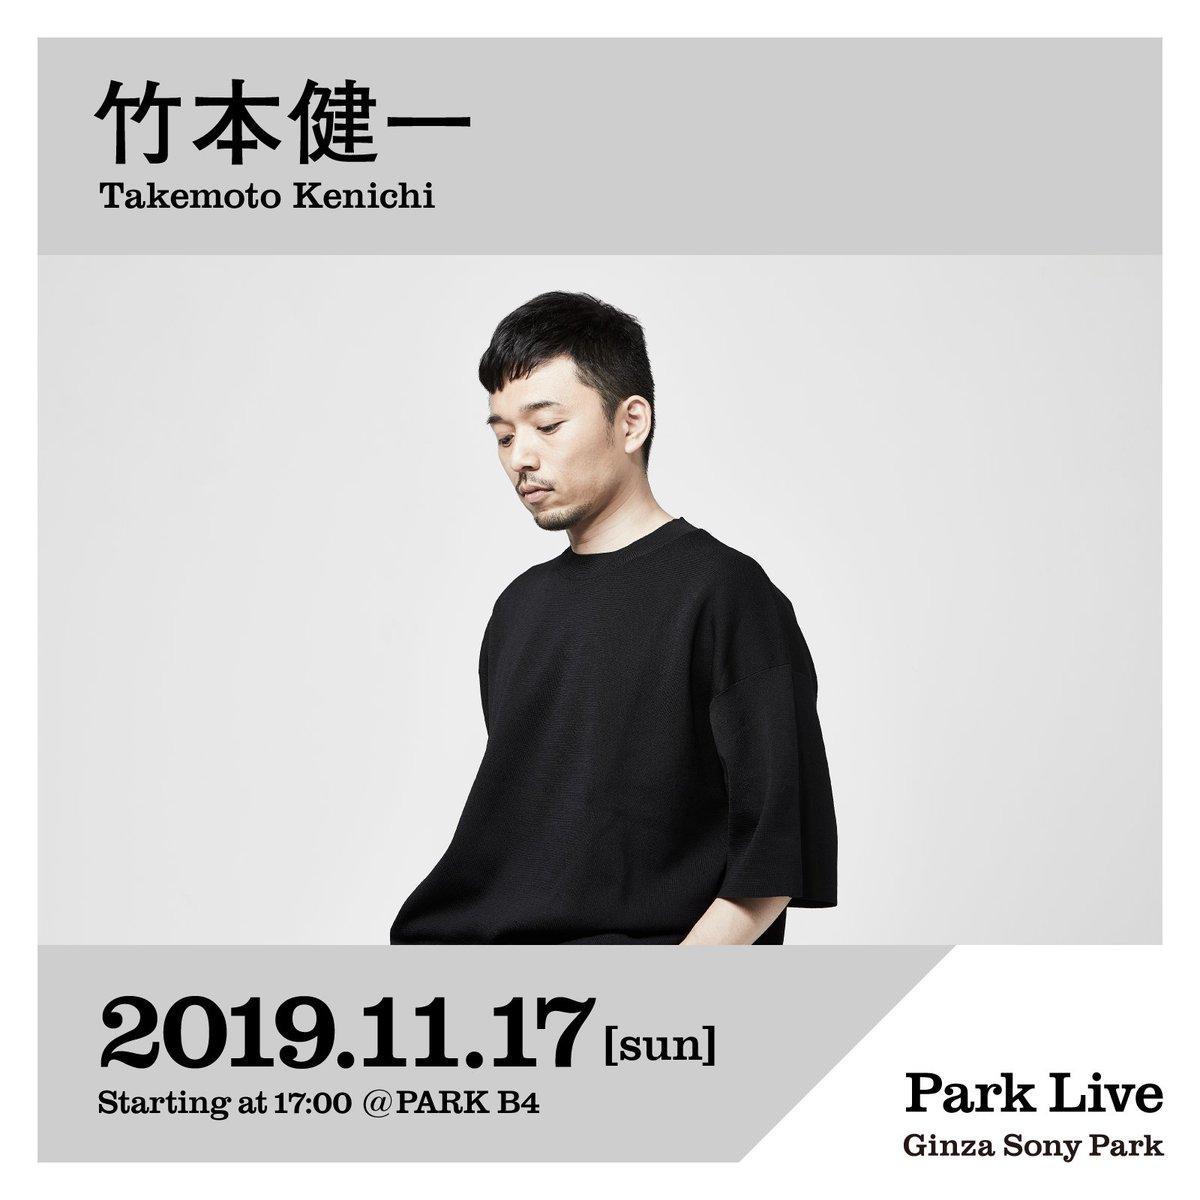 [#ParkLive]本日11/17(日)17:00〜は竹本健一によるPark Live。 詳細はInstagramをご覧ください。 Instagramでライブ配信予定です。 https://lnky.jp/ykZpPJc  @takemotokenichi #竹本健一 #kenichitakemoto #ginzasonypark #銀座ソニーパーク #parklive #parkliveartist #ginza #銀座 #ライブ #live